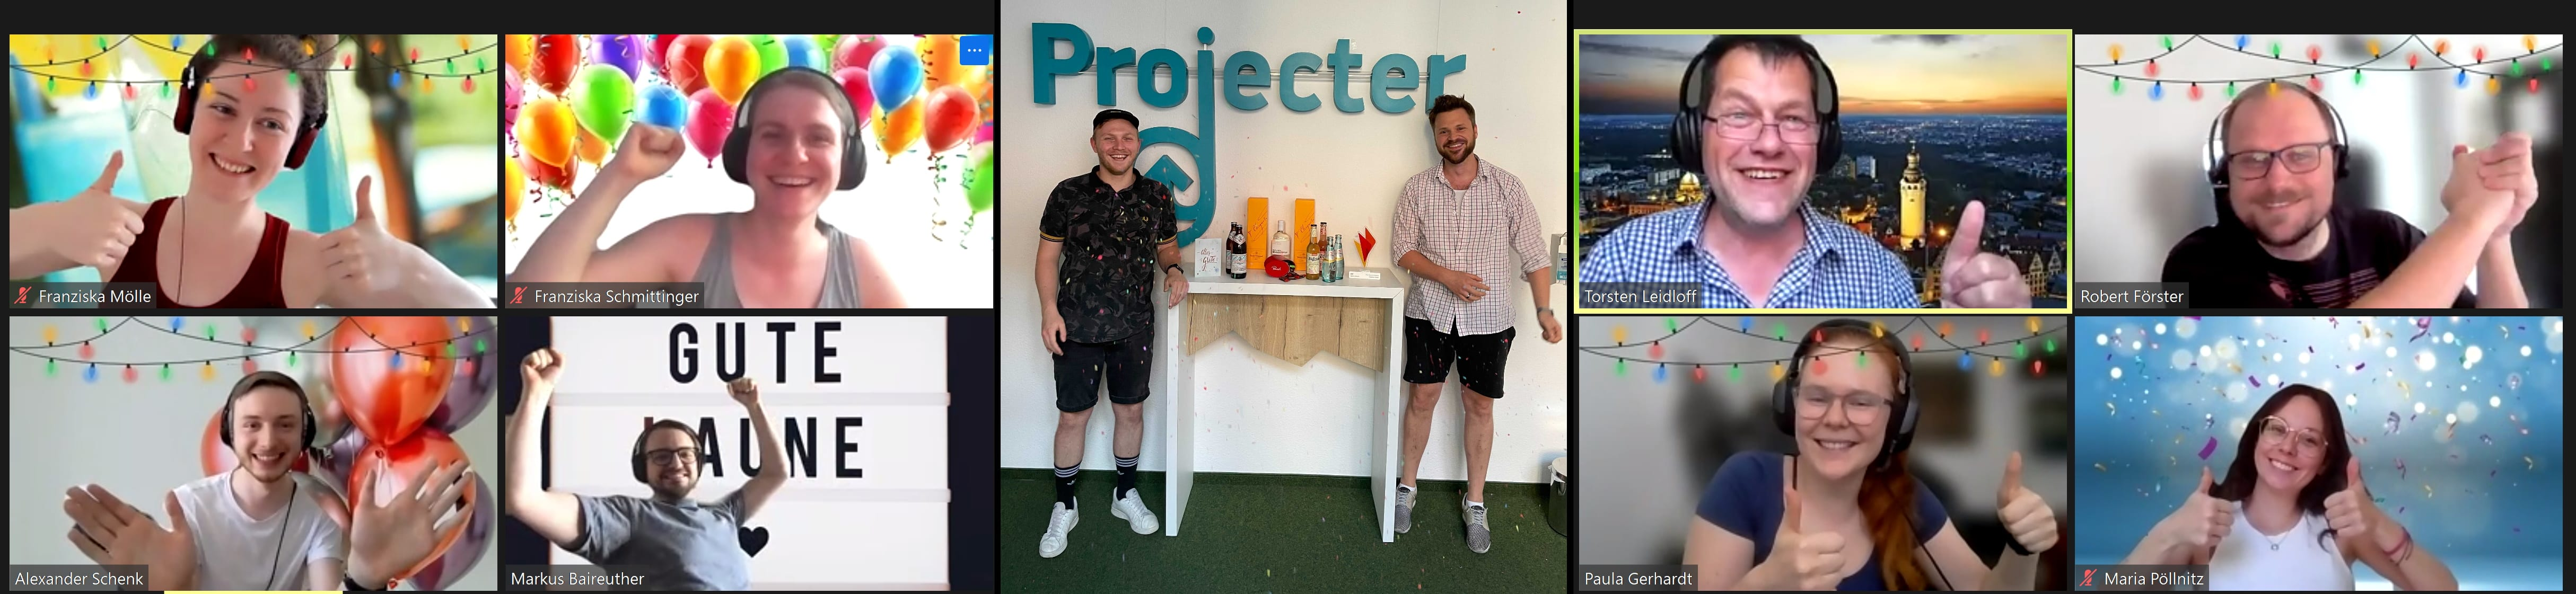 Gewinner Projecter